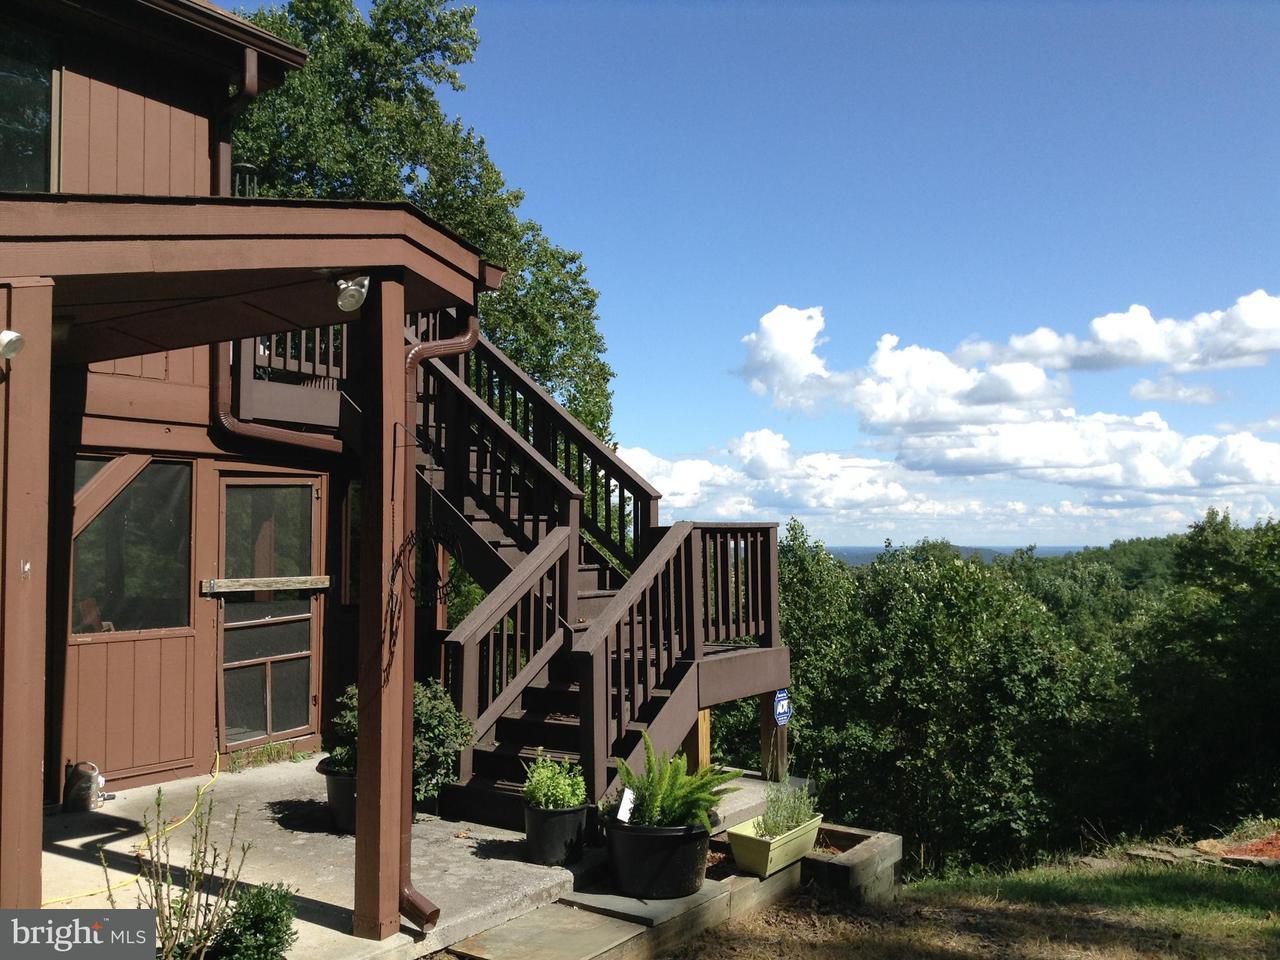 独户住宅 为 销售 在 160 RUSH RIVER Lane 160 RUSH RIVER Lane Washington, 弗吉尼亚州 22747 美国